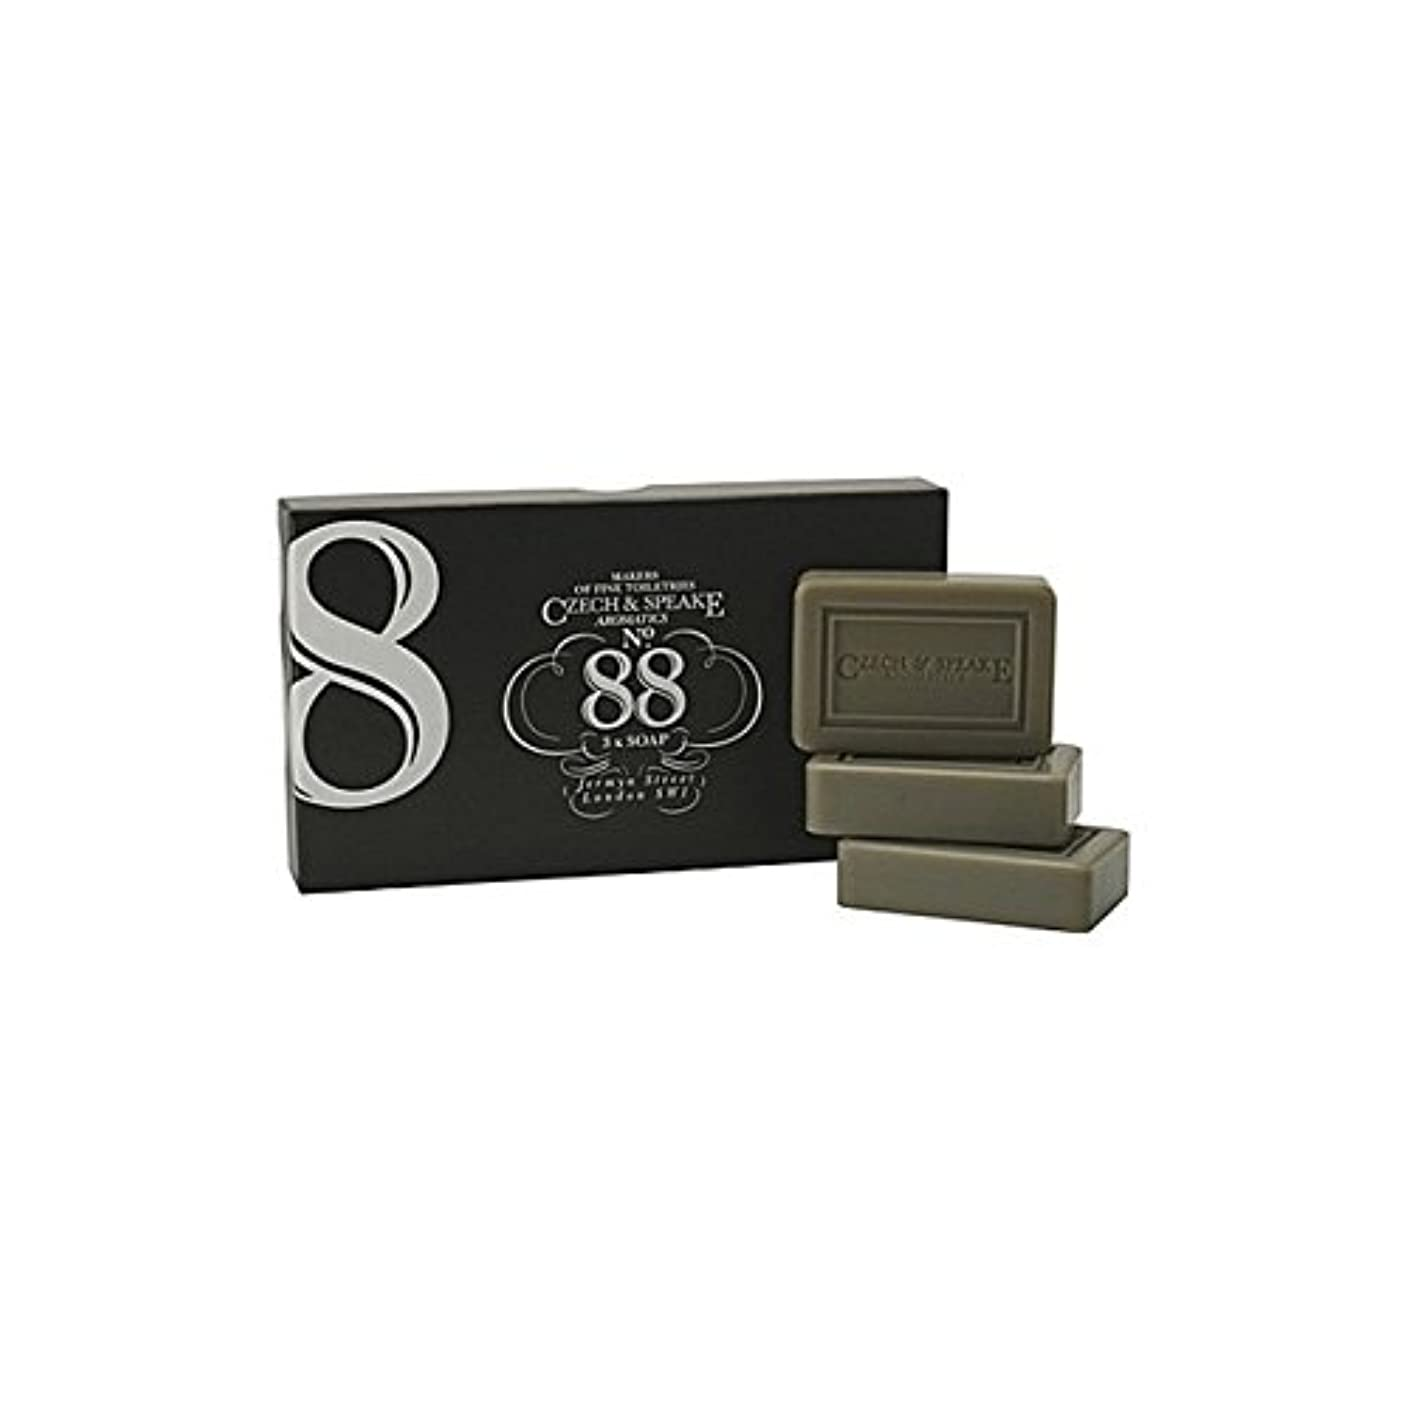 Czech & Speake No.88 Soap Set (Pack of 6) - チェコ&スピーク.88ソープセット x6 [並行輸入品]